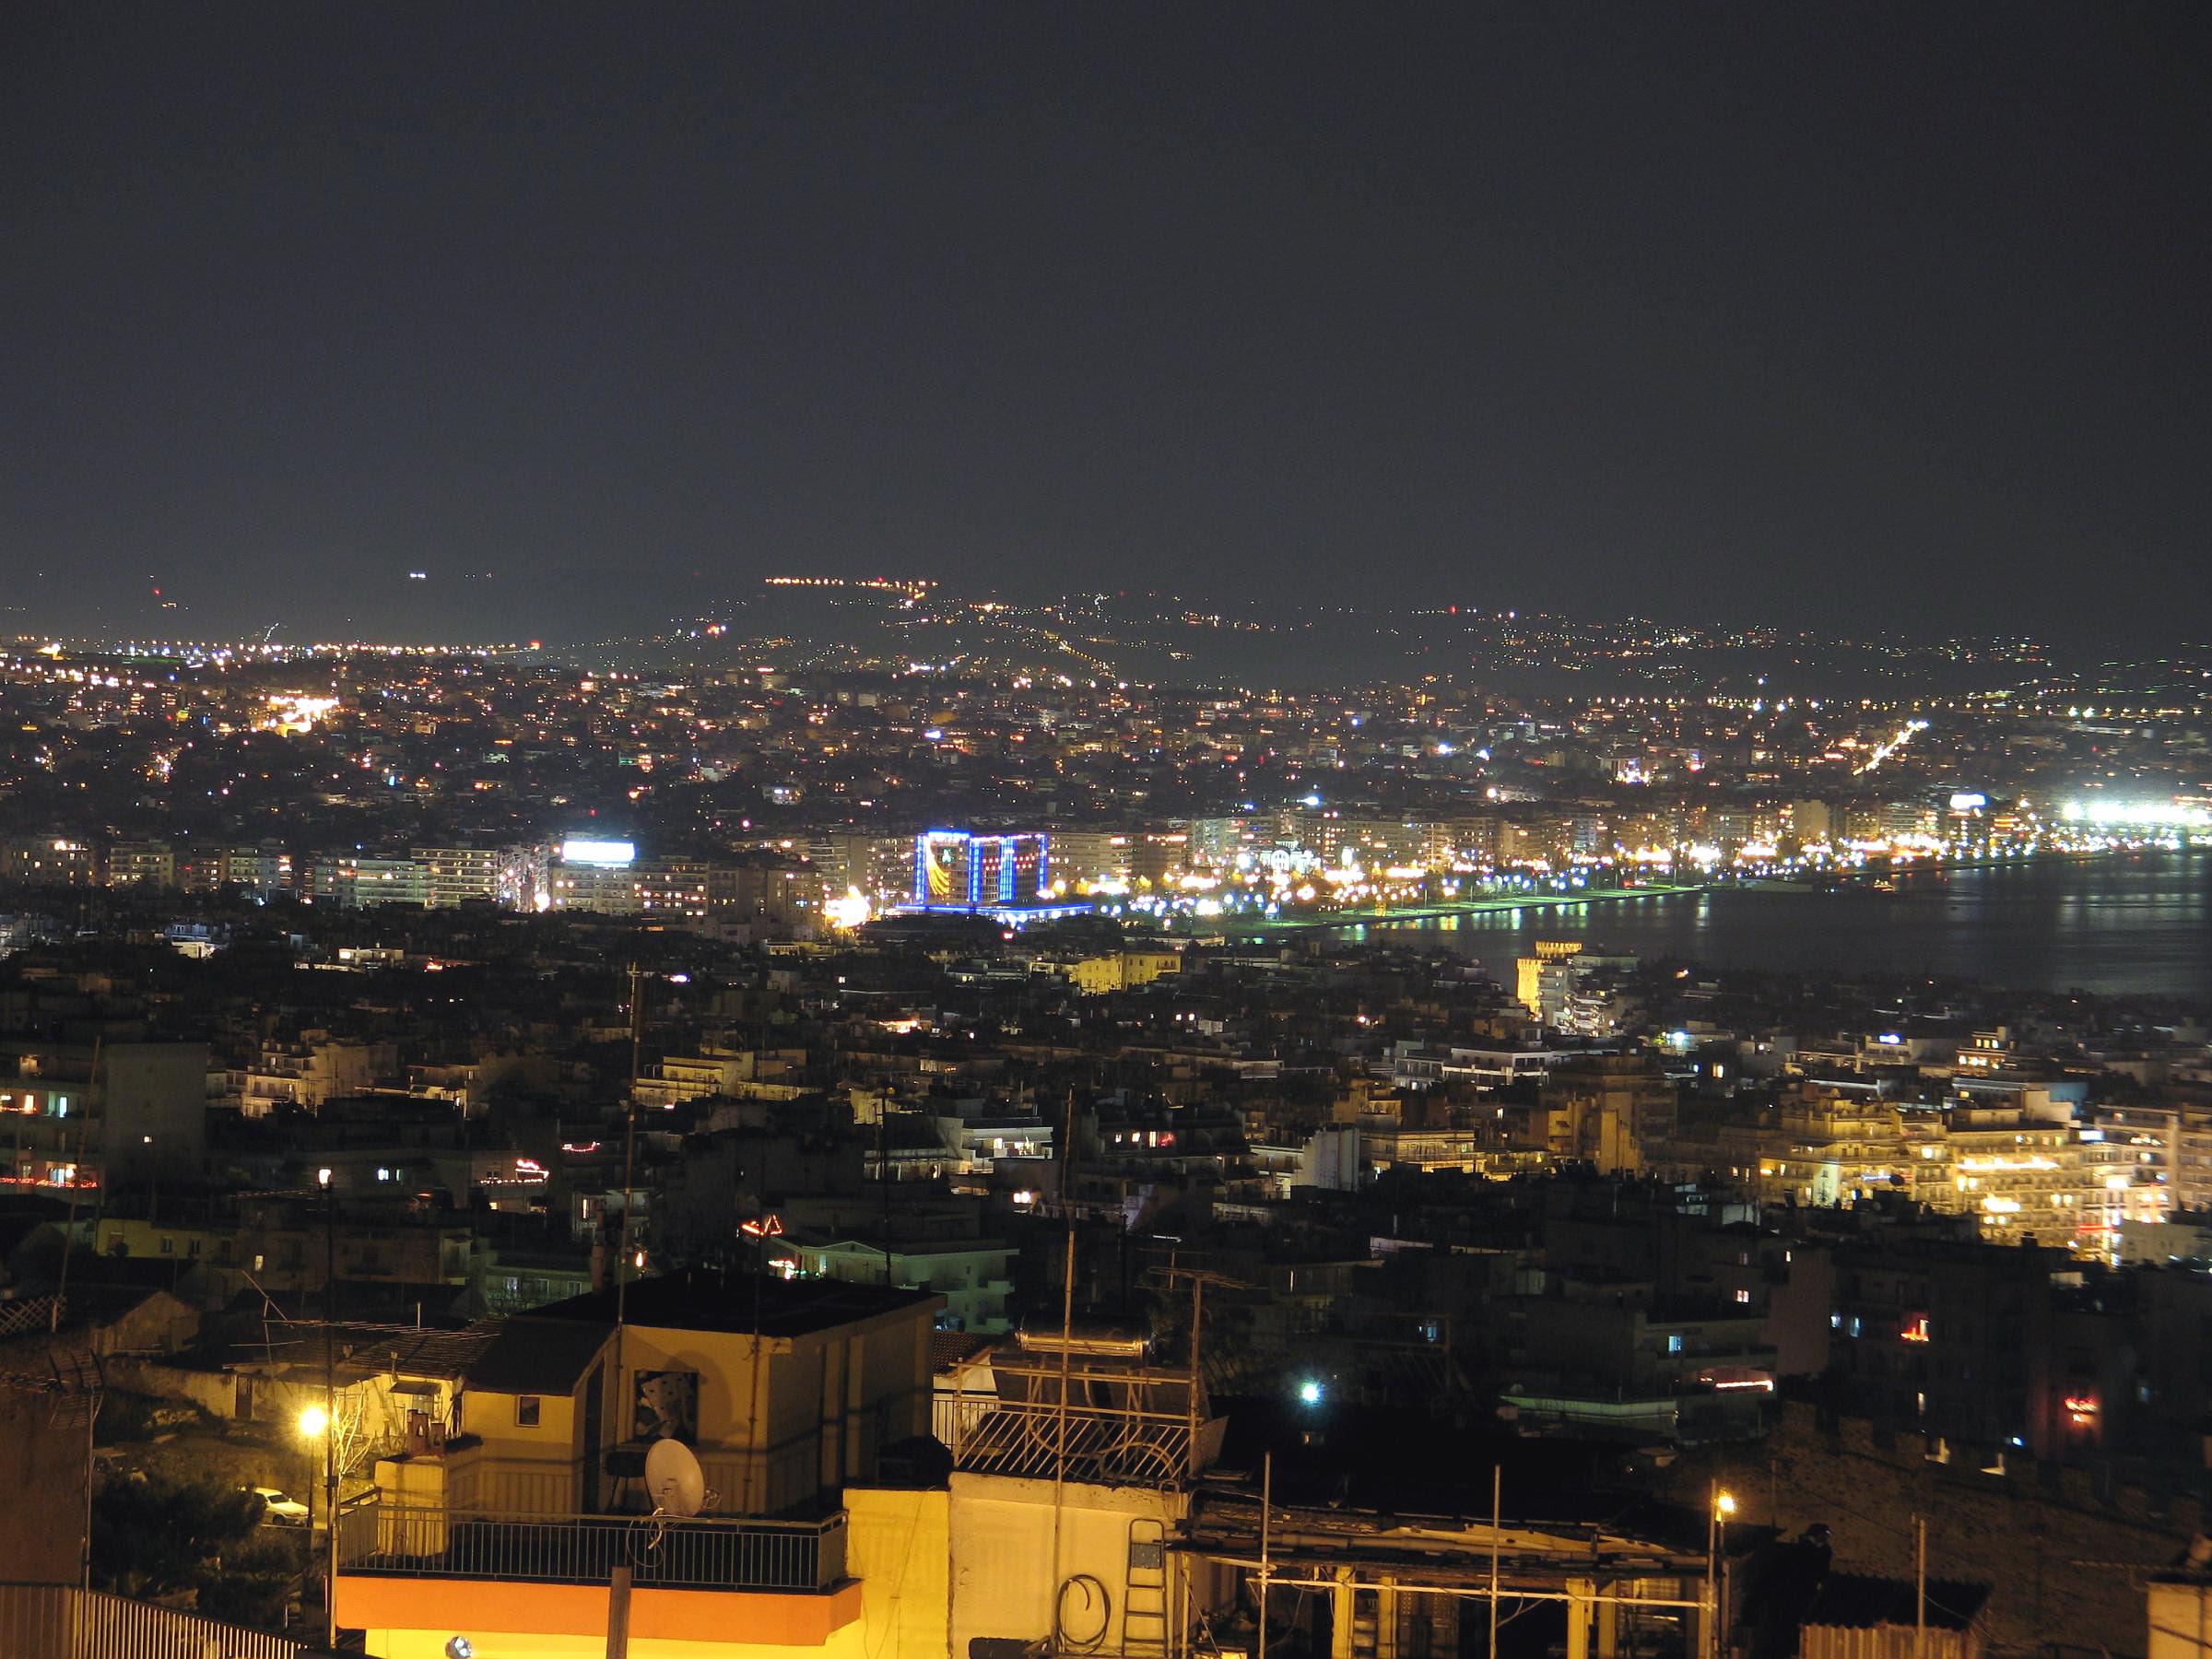 http://upload.wikimedia.org/wikipedia/en/1/1f/Thessaloniki_night.jpg